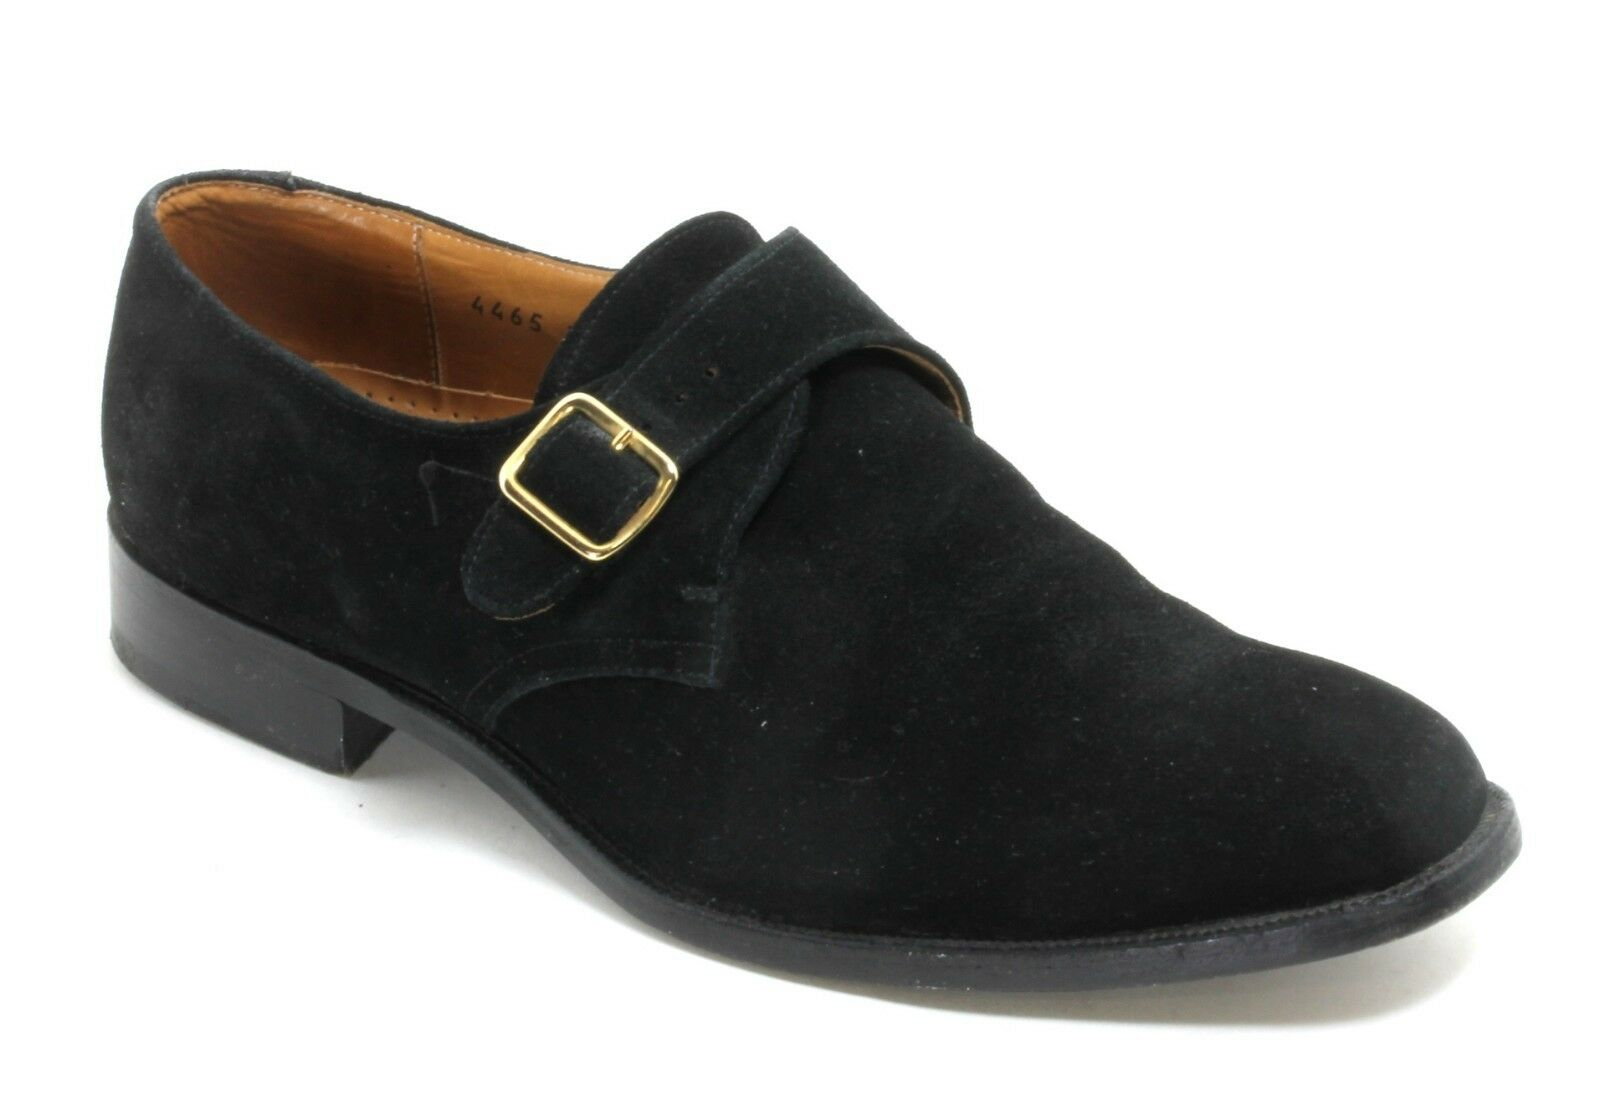 Schuhe Herrenschuhe Halbschuh Schnürschuhe Brogues Finsbury Schnalle Riemen 42,5